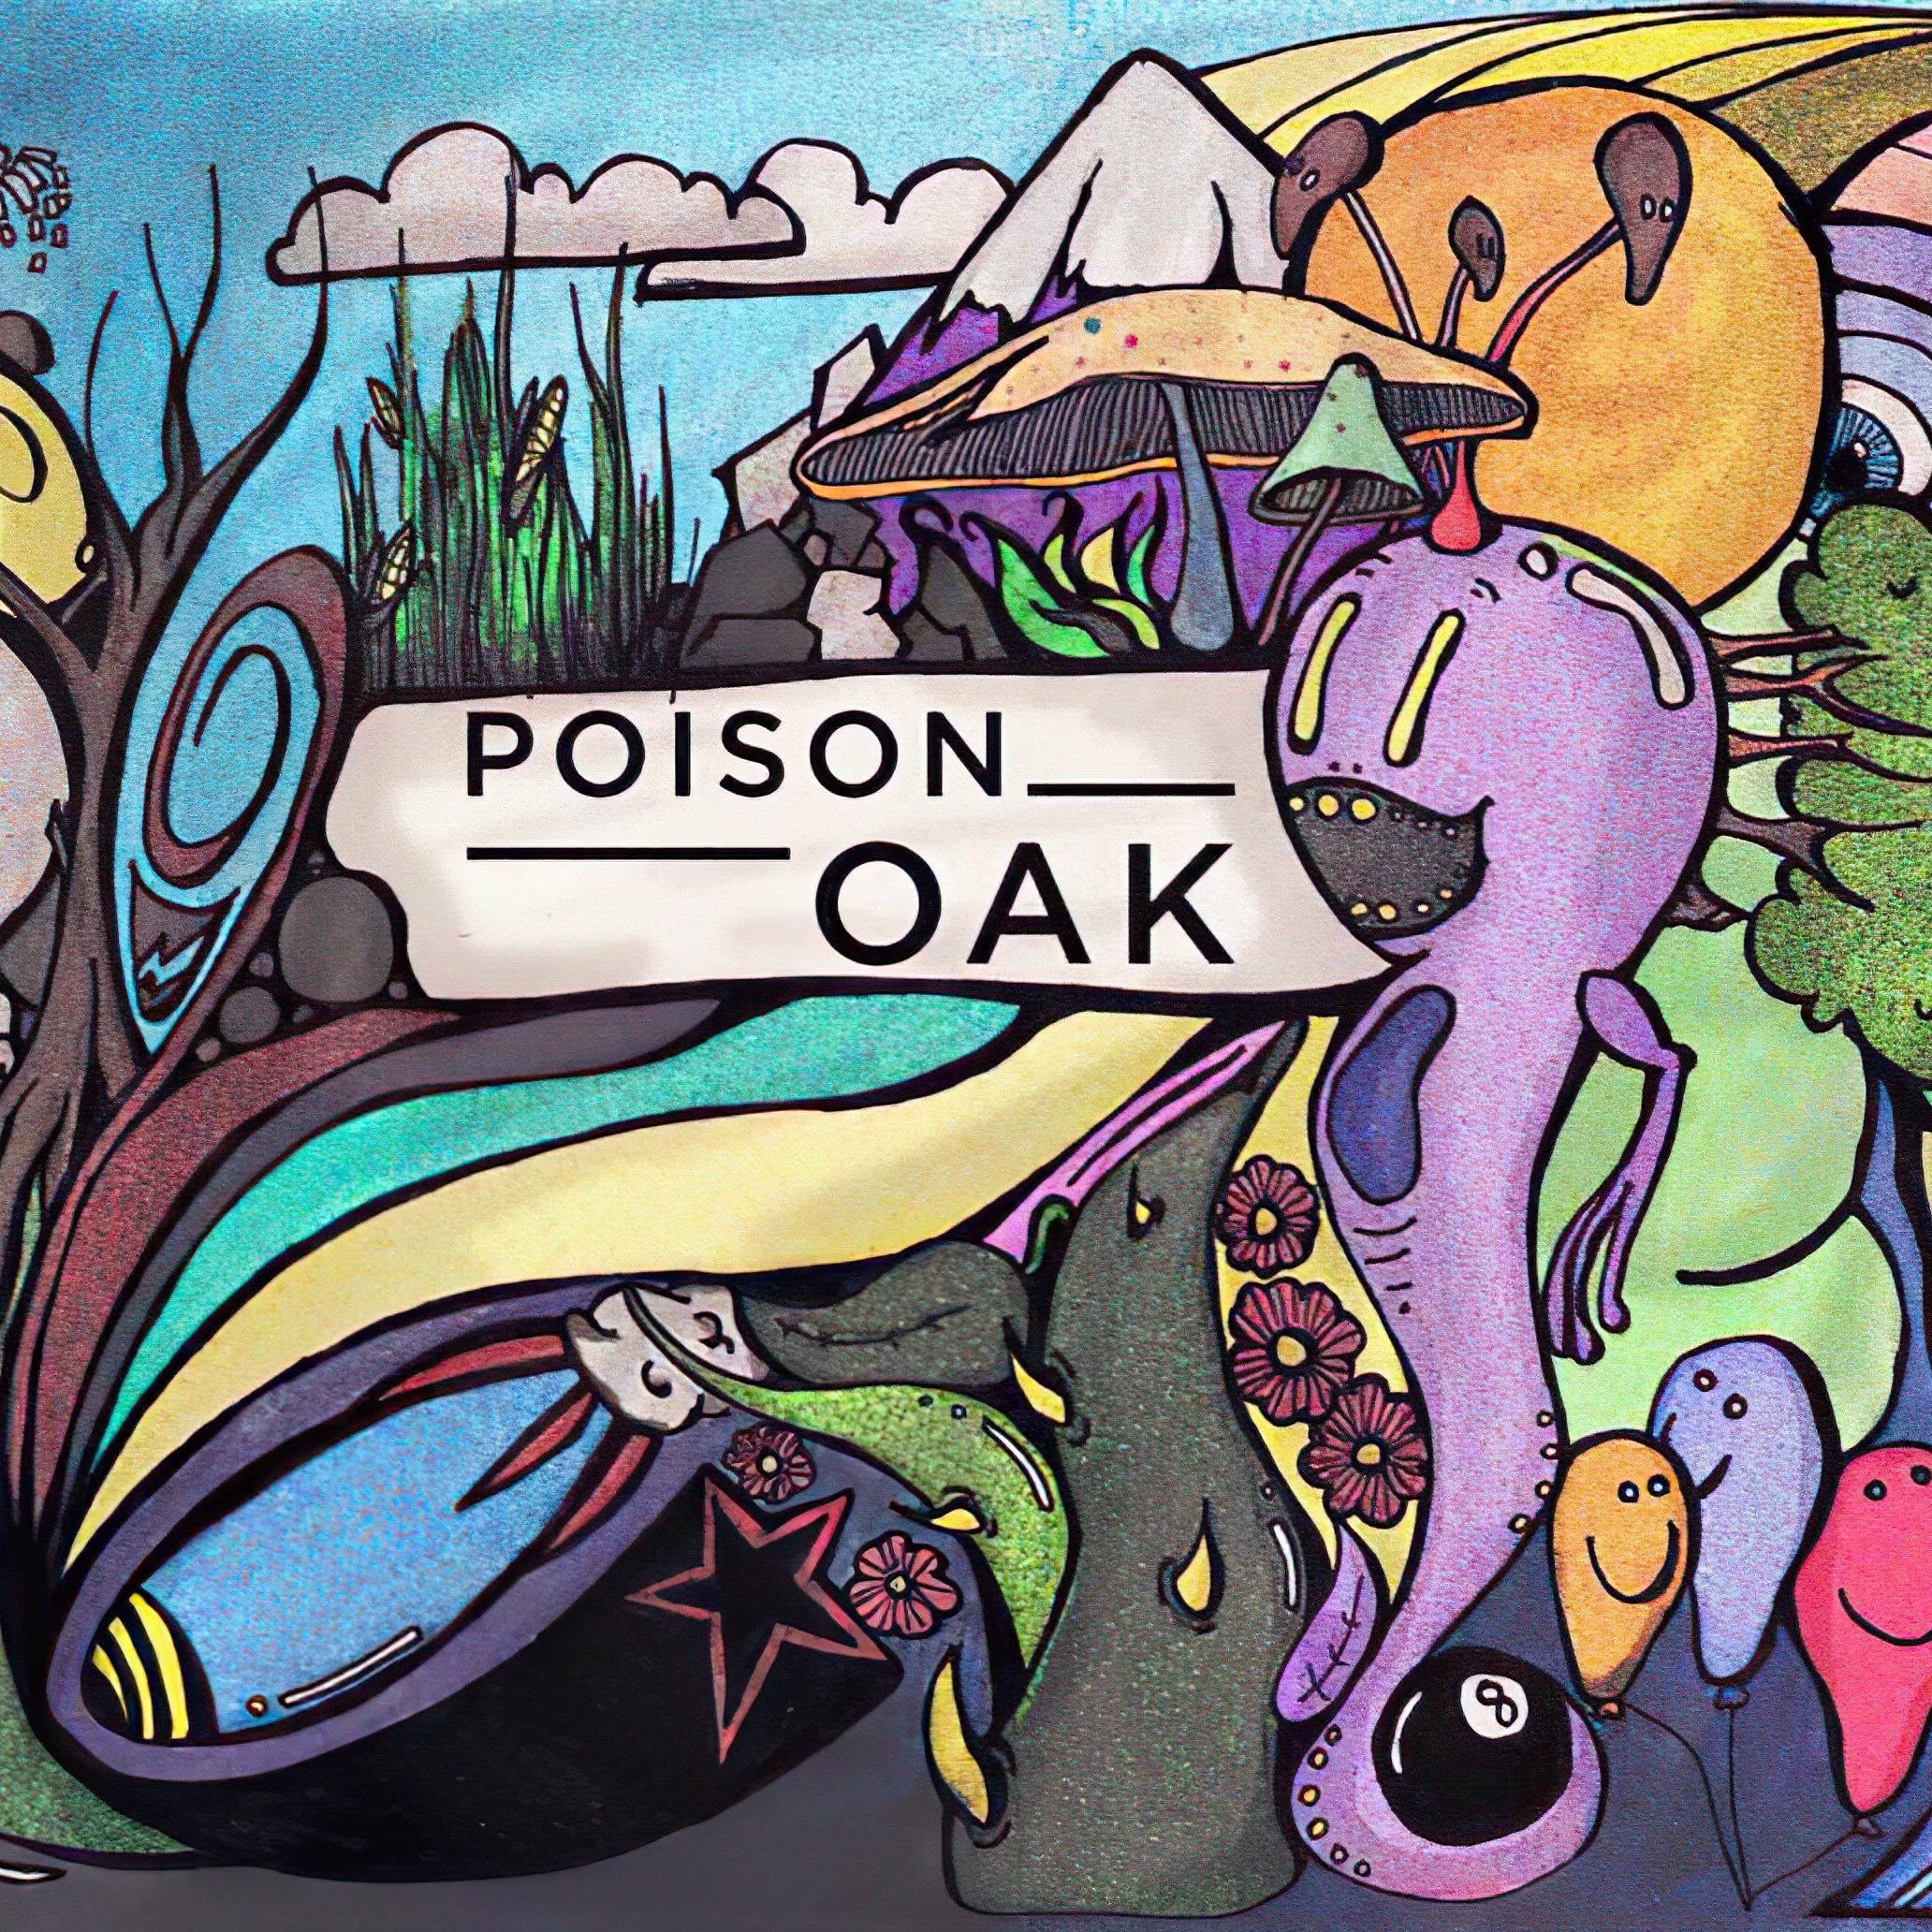 Poison Oak (poisonoak) Profile Image | Linktree